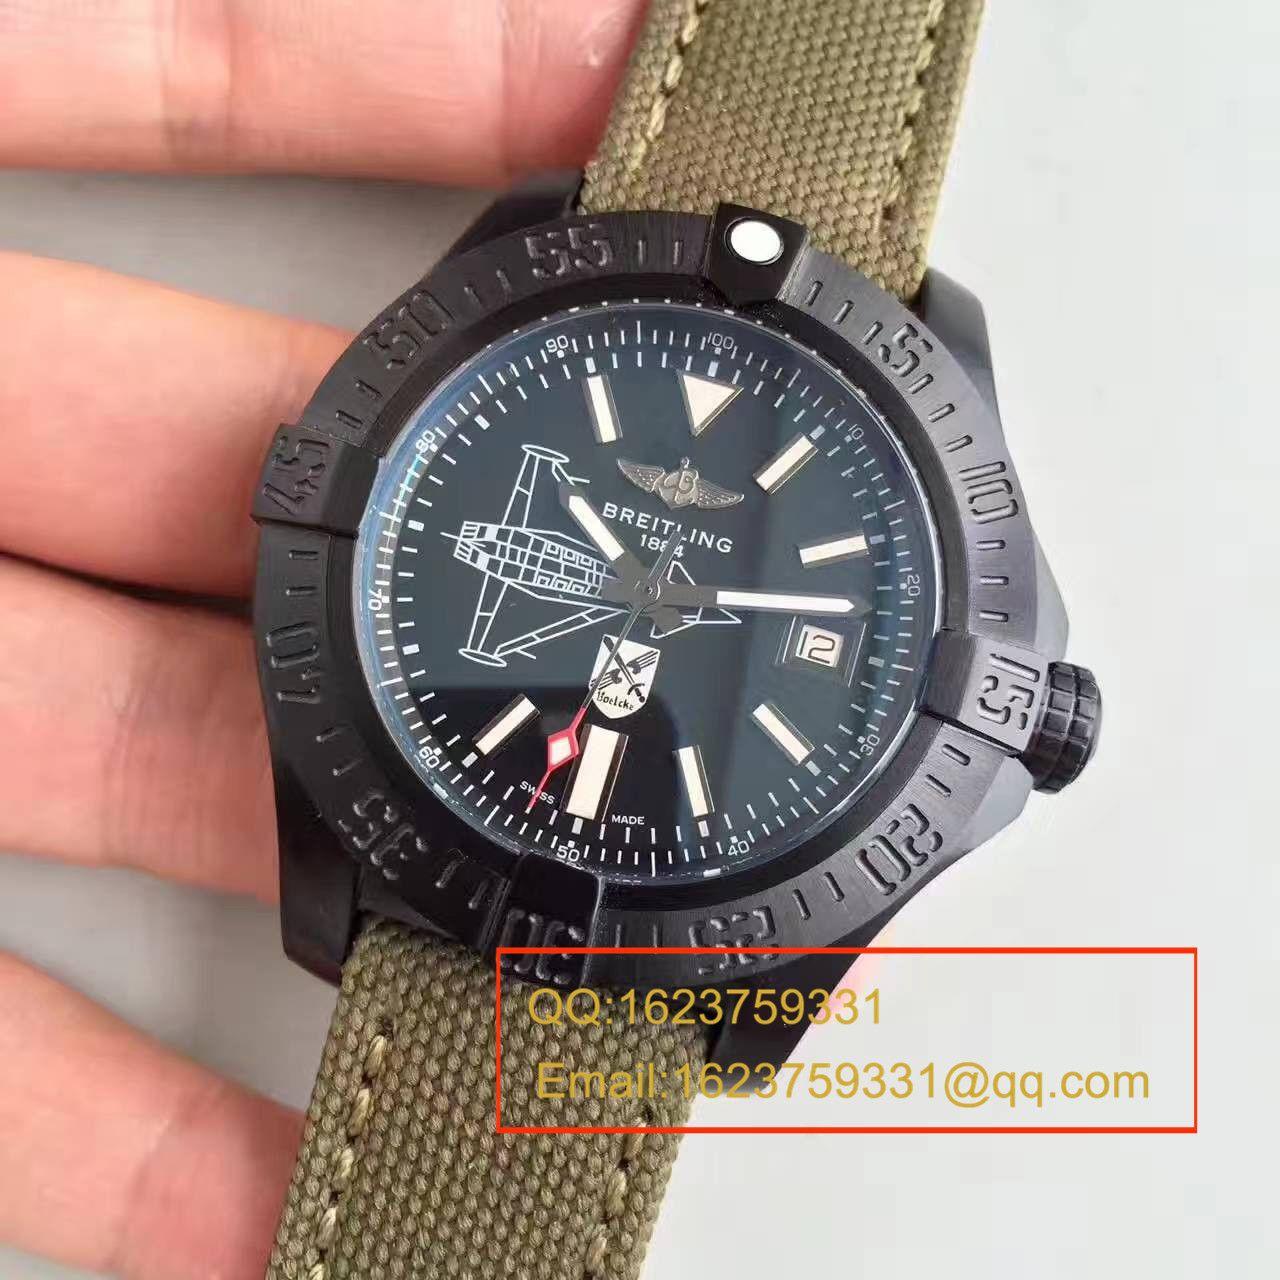 【BL一比一超A复刻手表】百年灵复仇者二代海狼限量版纪念德国战斗机版《斯瓦尔德·伯尔克Oswald Boelcke 》 / BL067